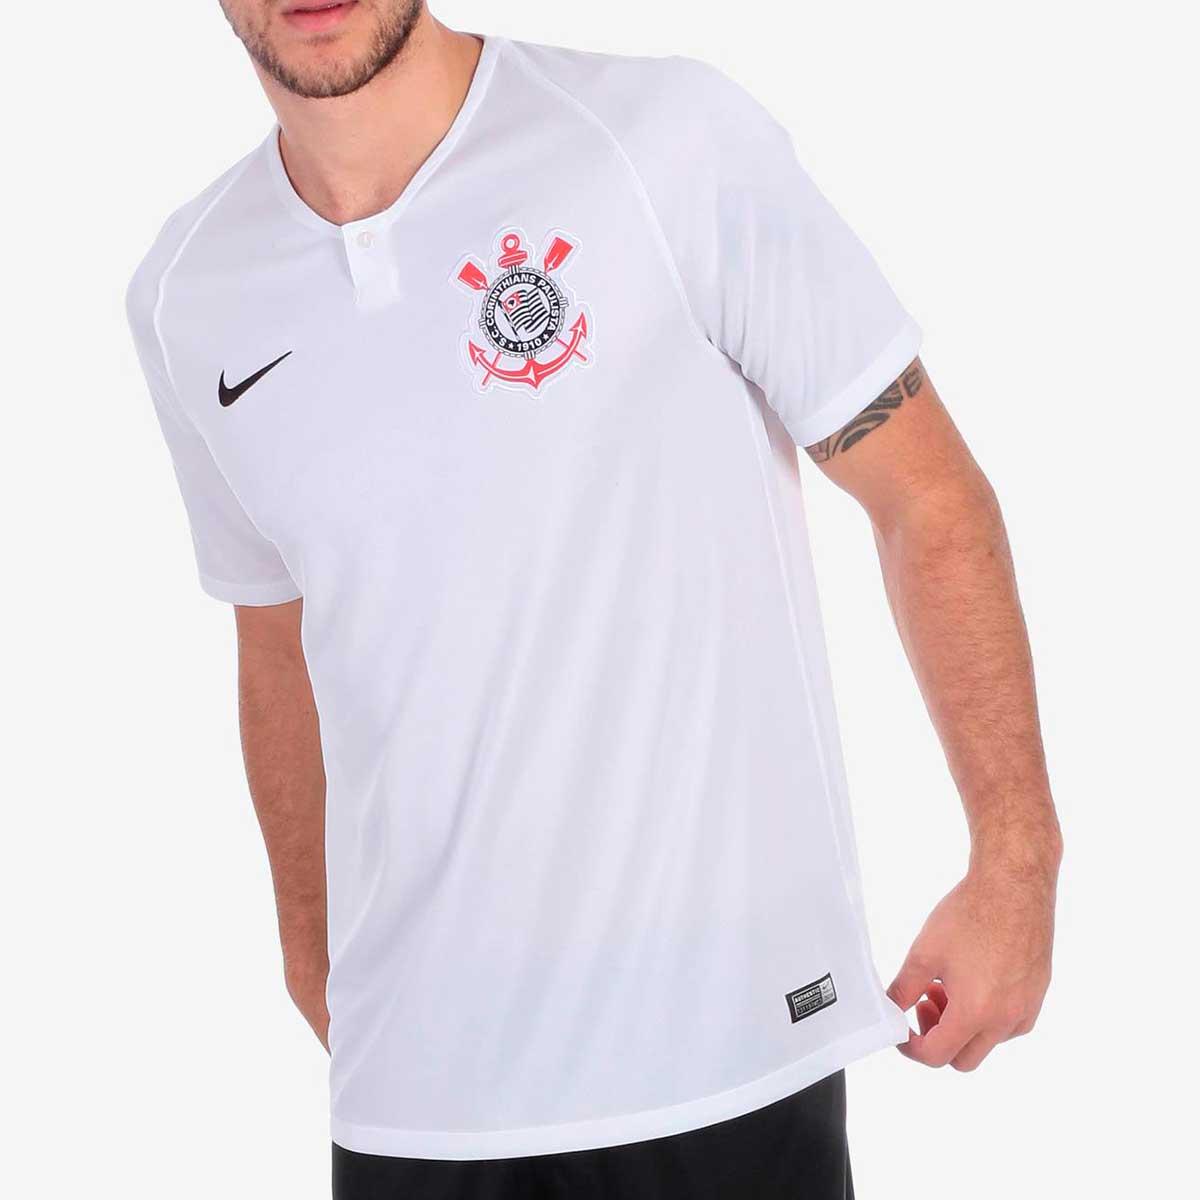 e9b2c95dda3a4 Camisa Nike Corinthians I 2018 19 Torcedor Masculina